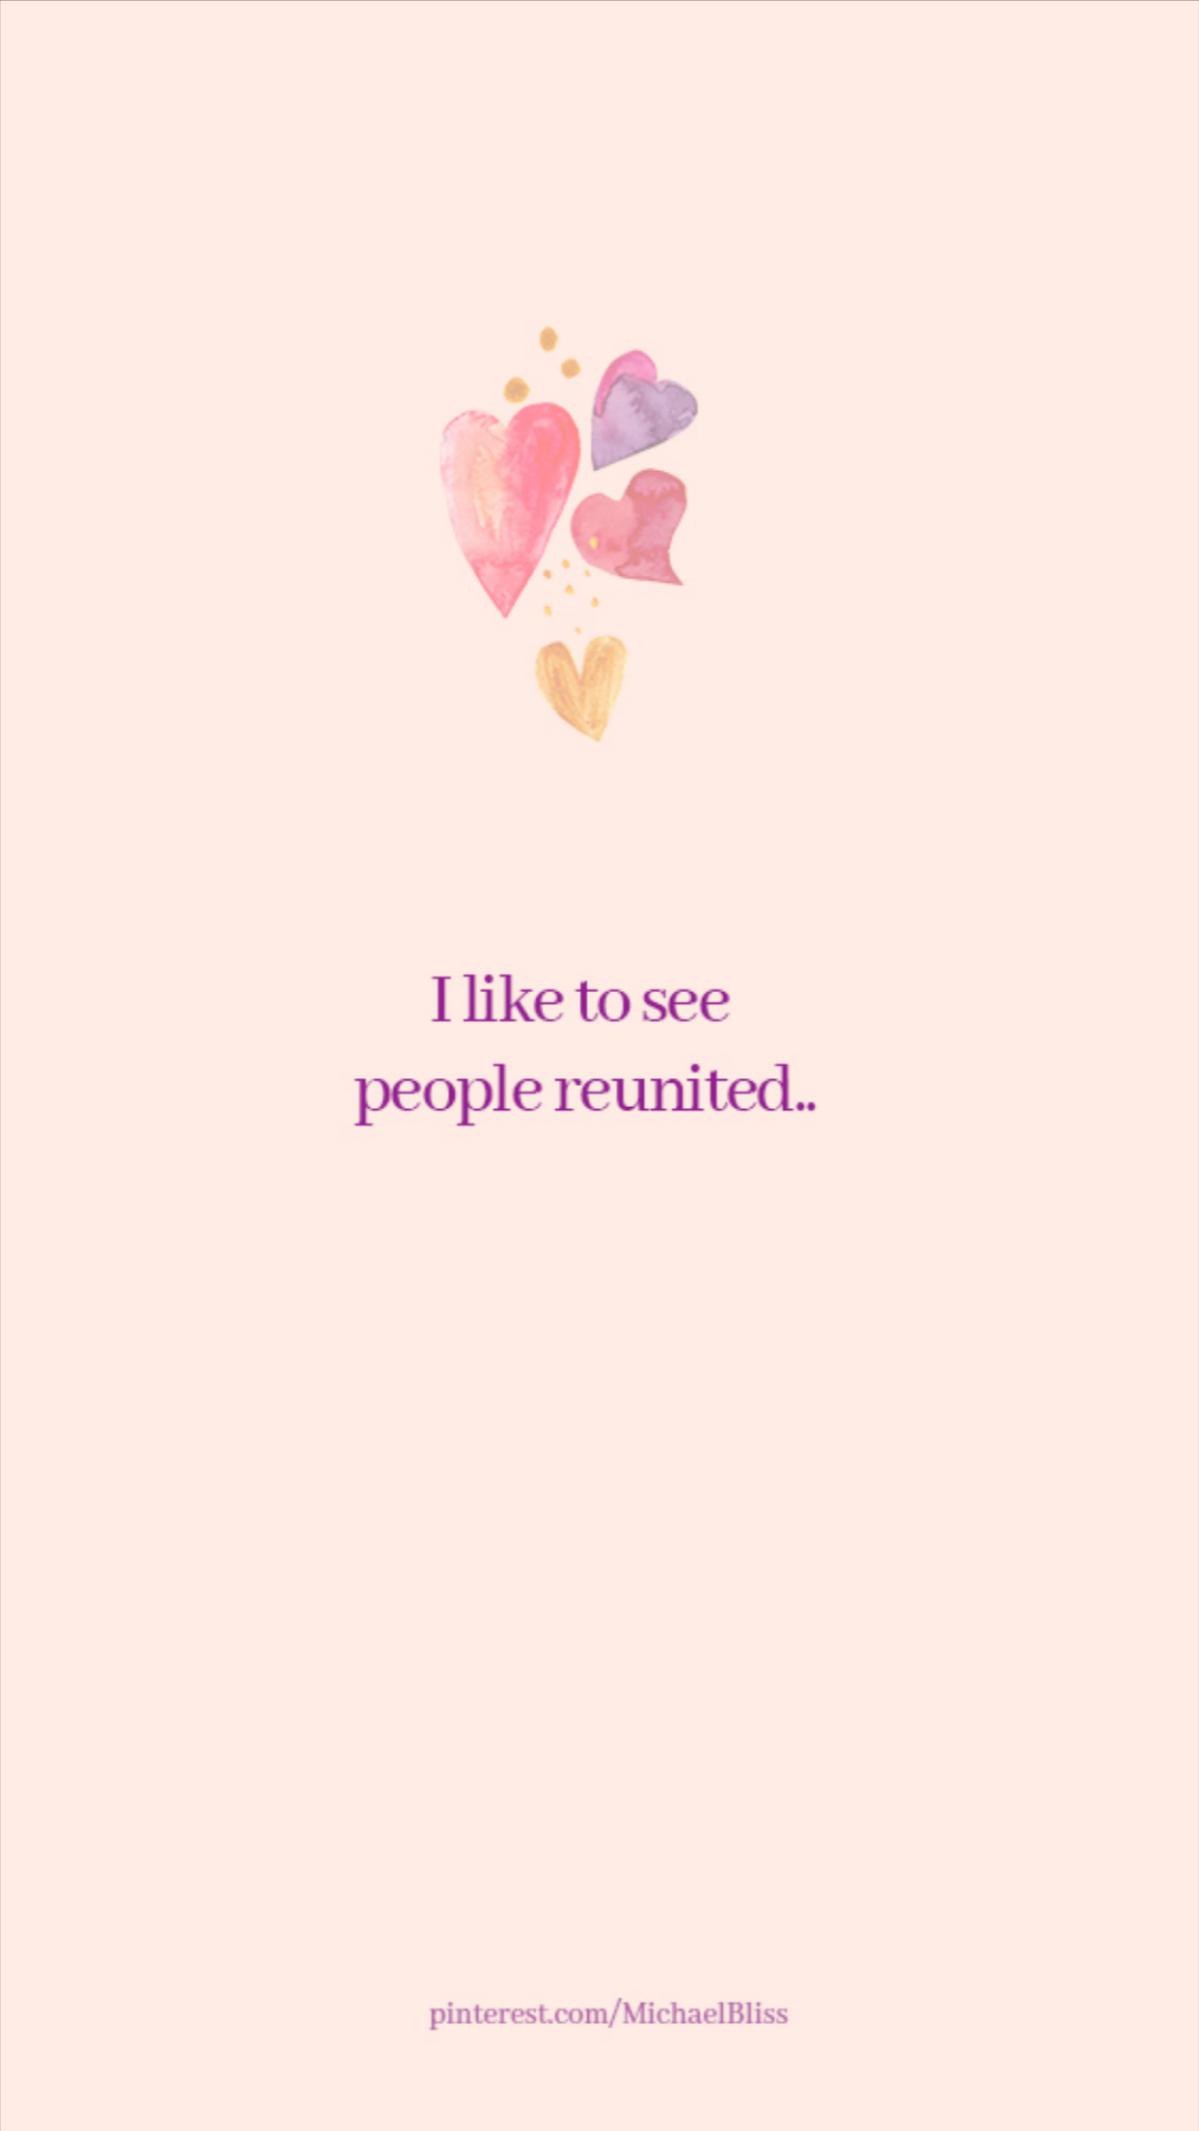 I like to see people reunited